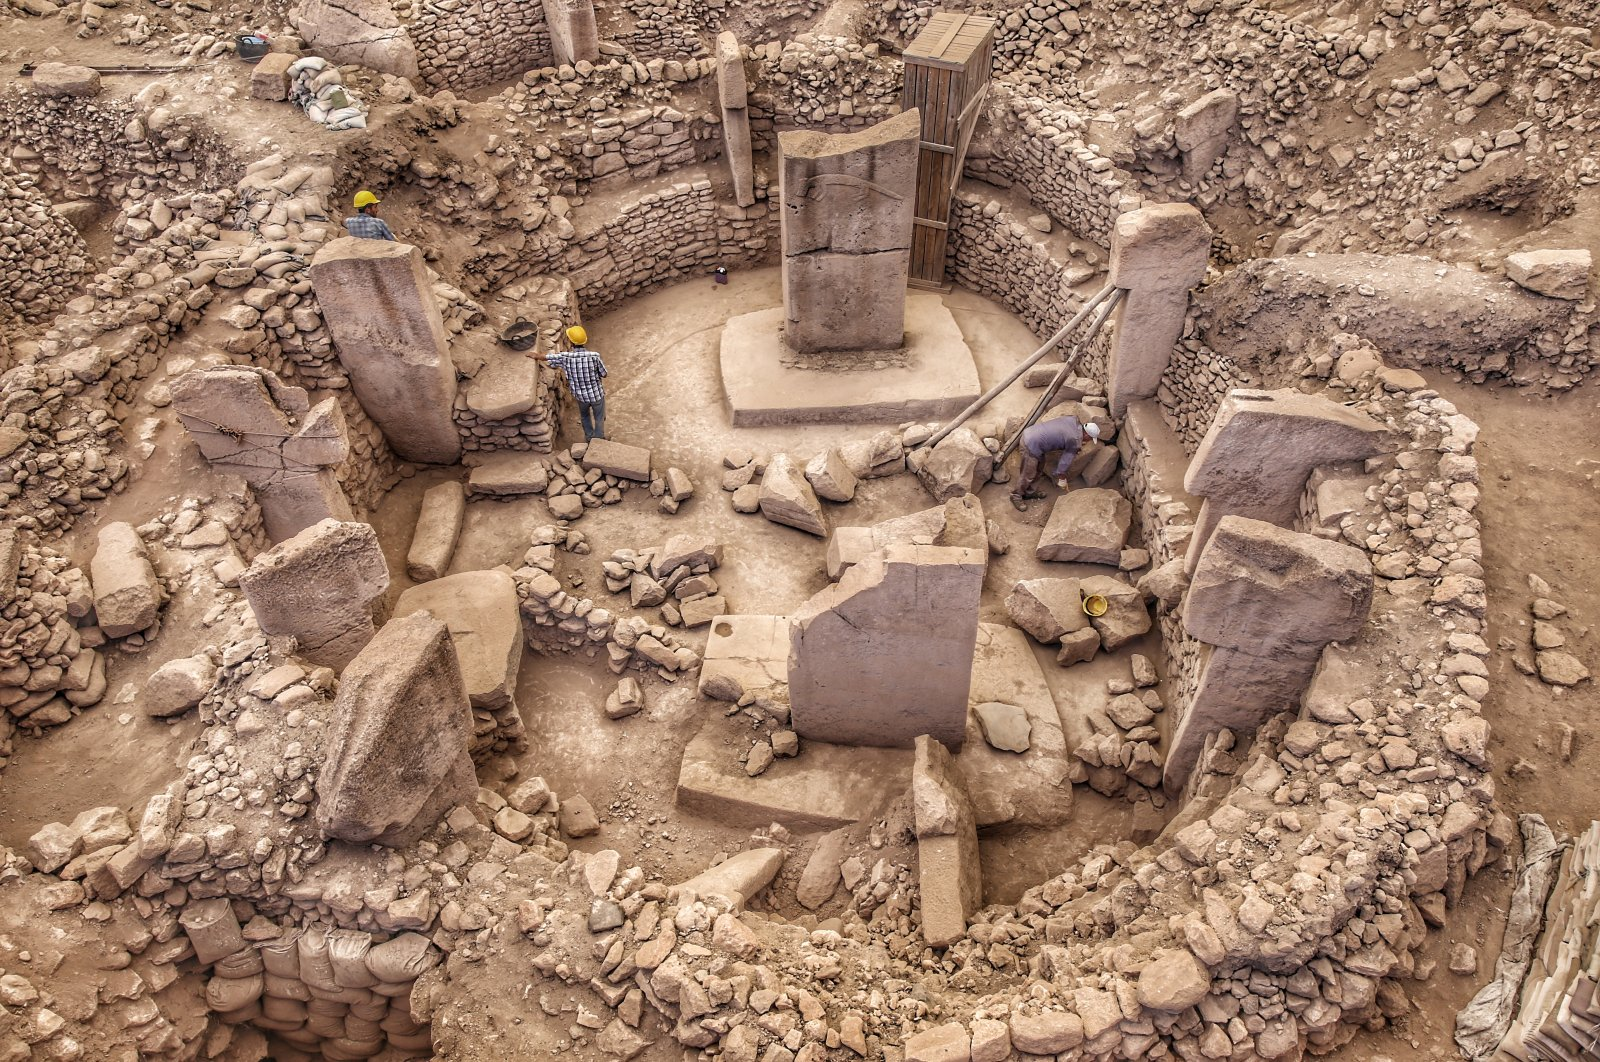 Göbeklitepe has been visited 1,673,000 times. (Photo by Saffet Azak)